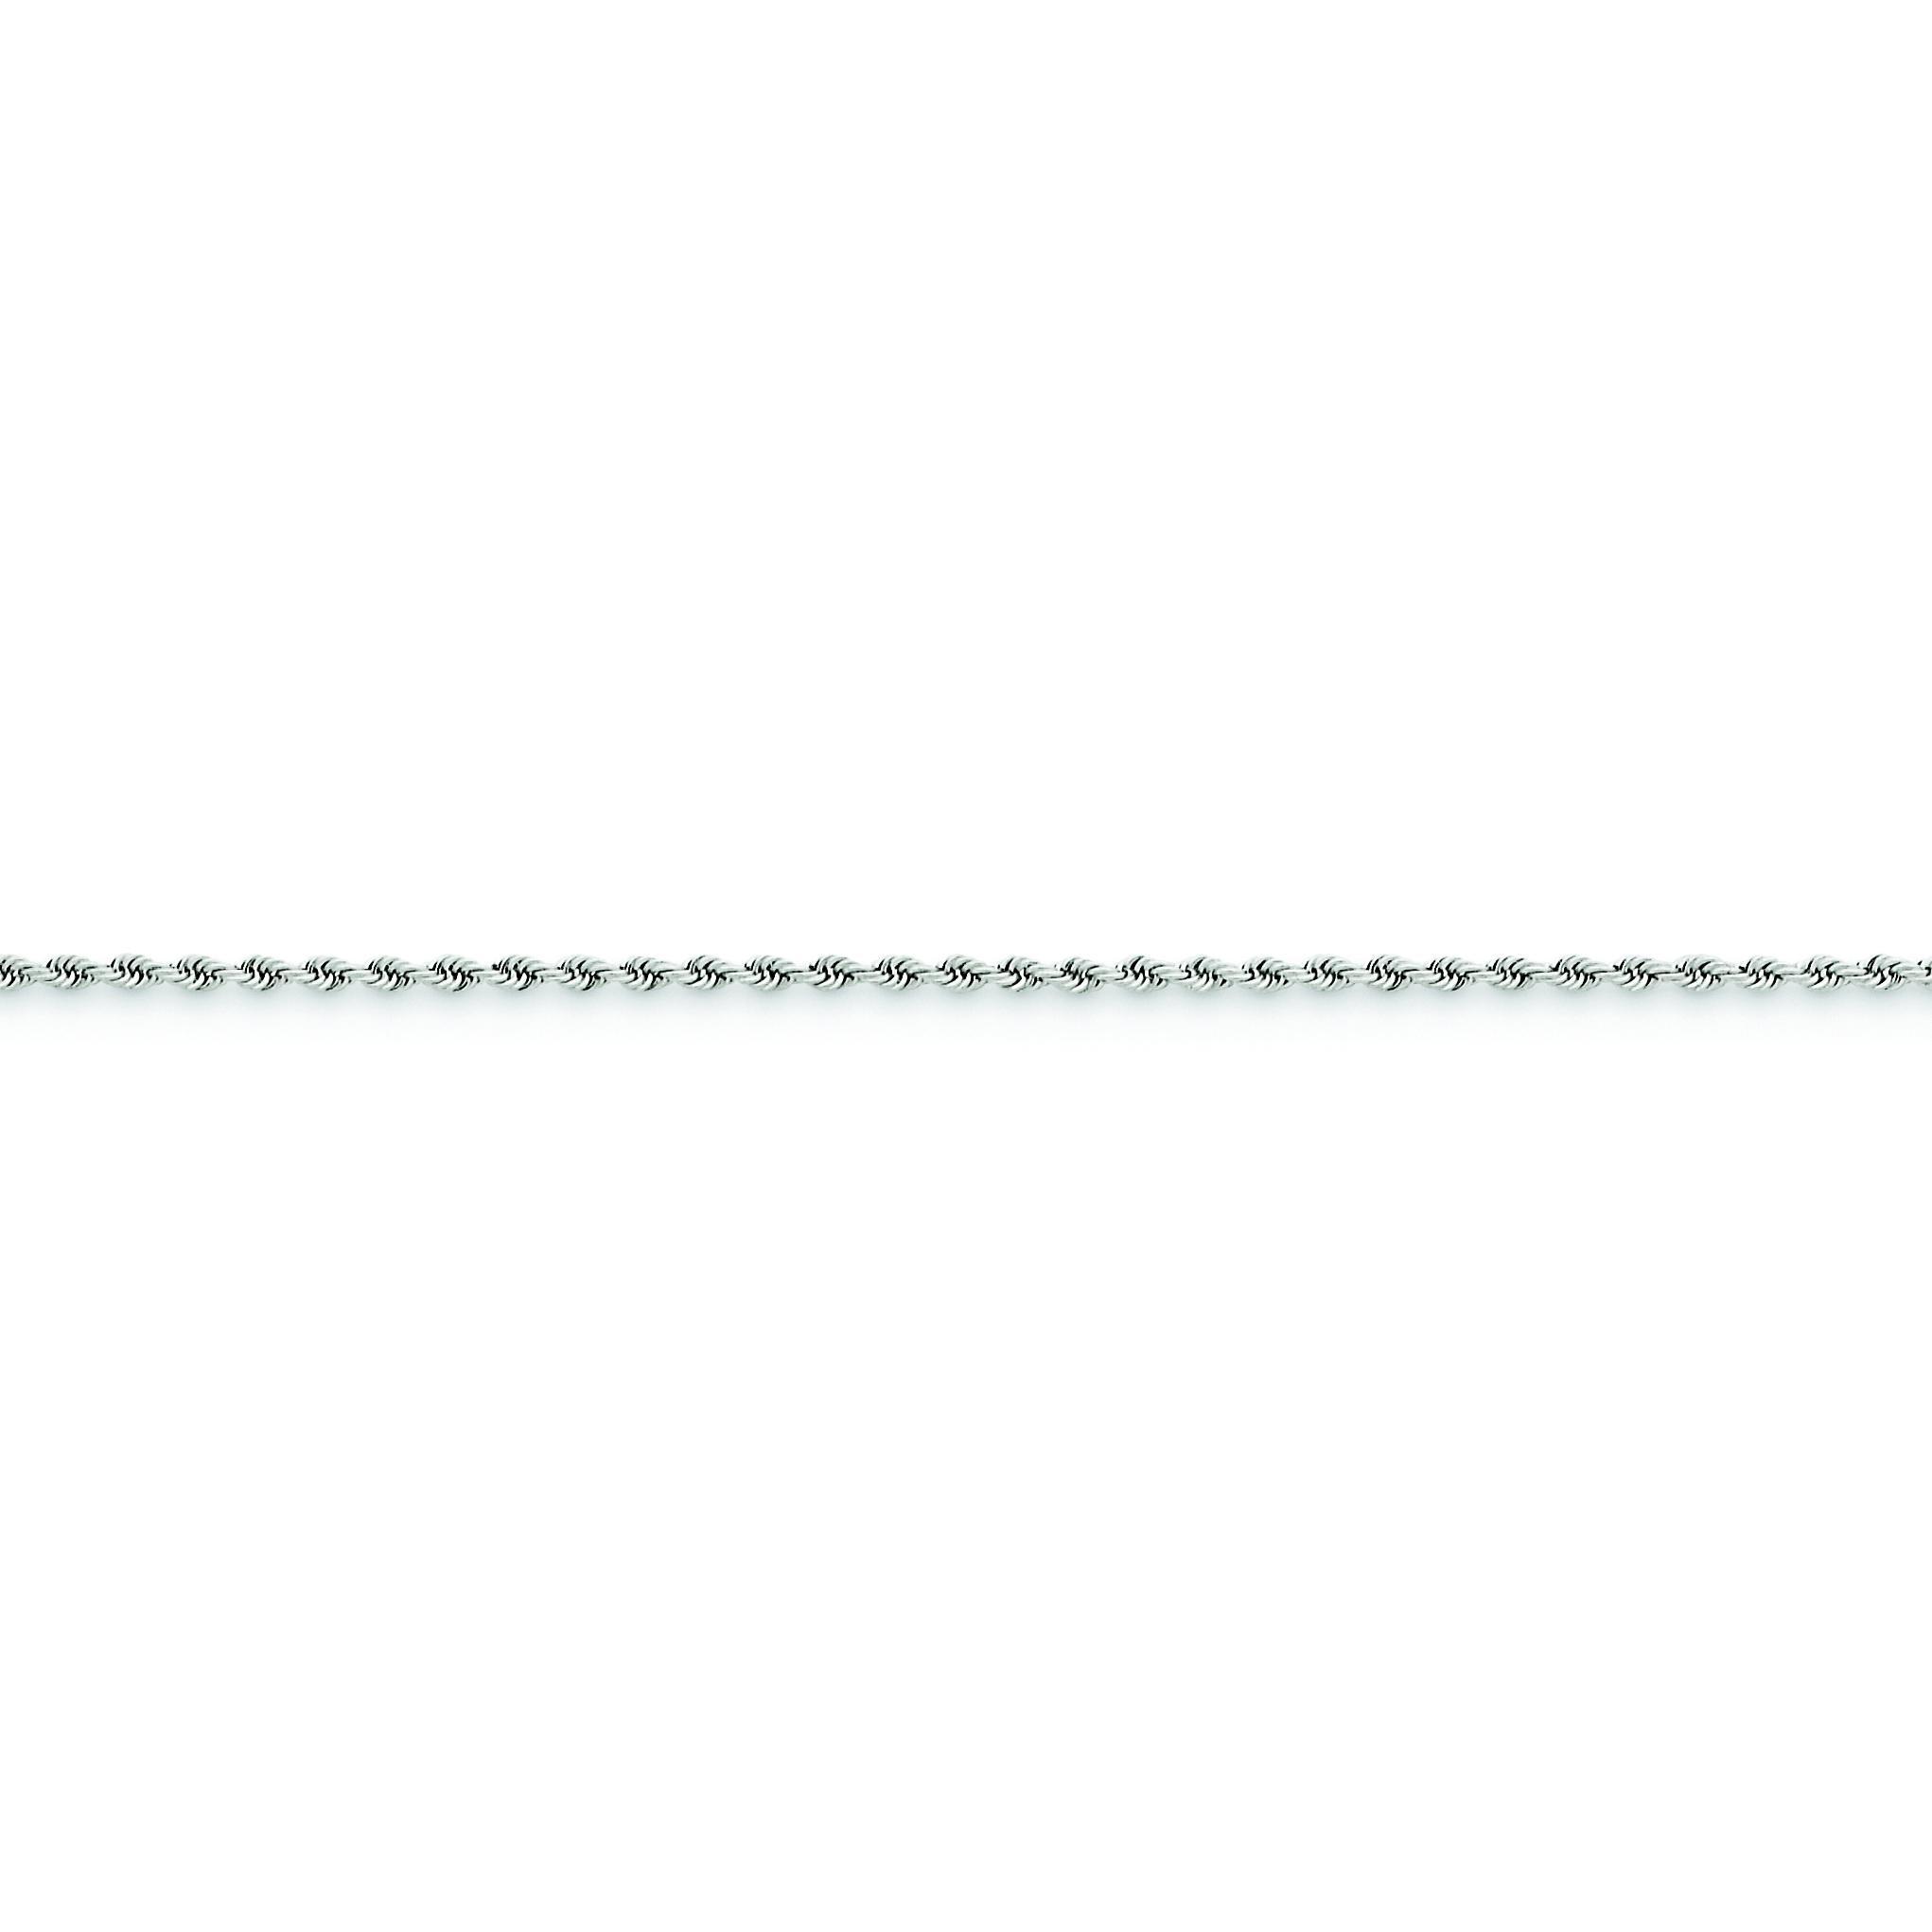 14k Yellow Gold 7 inch 1.75 mm Handmade Regular Rope Chain Bracelet